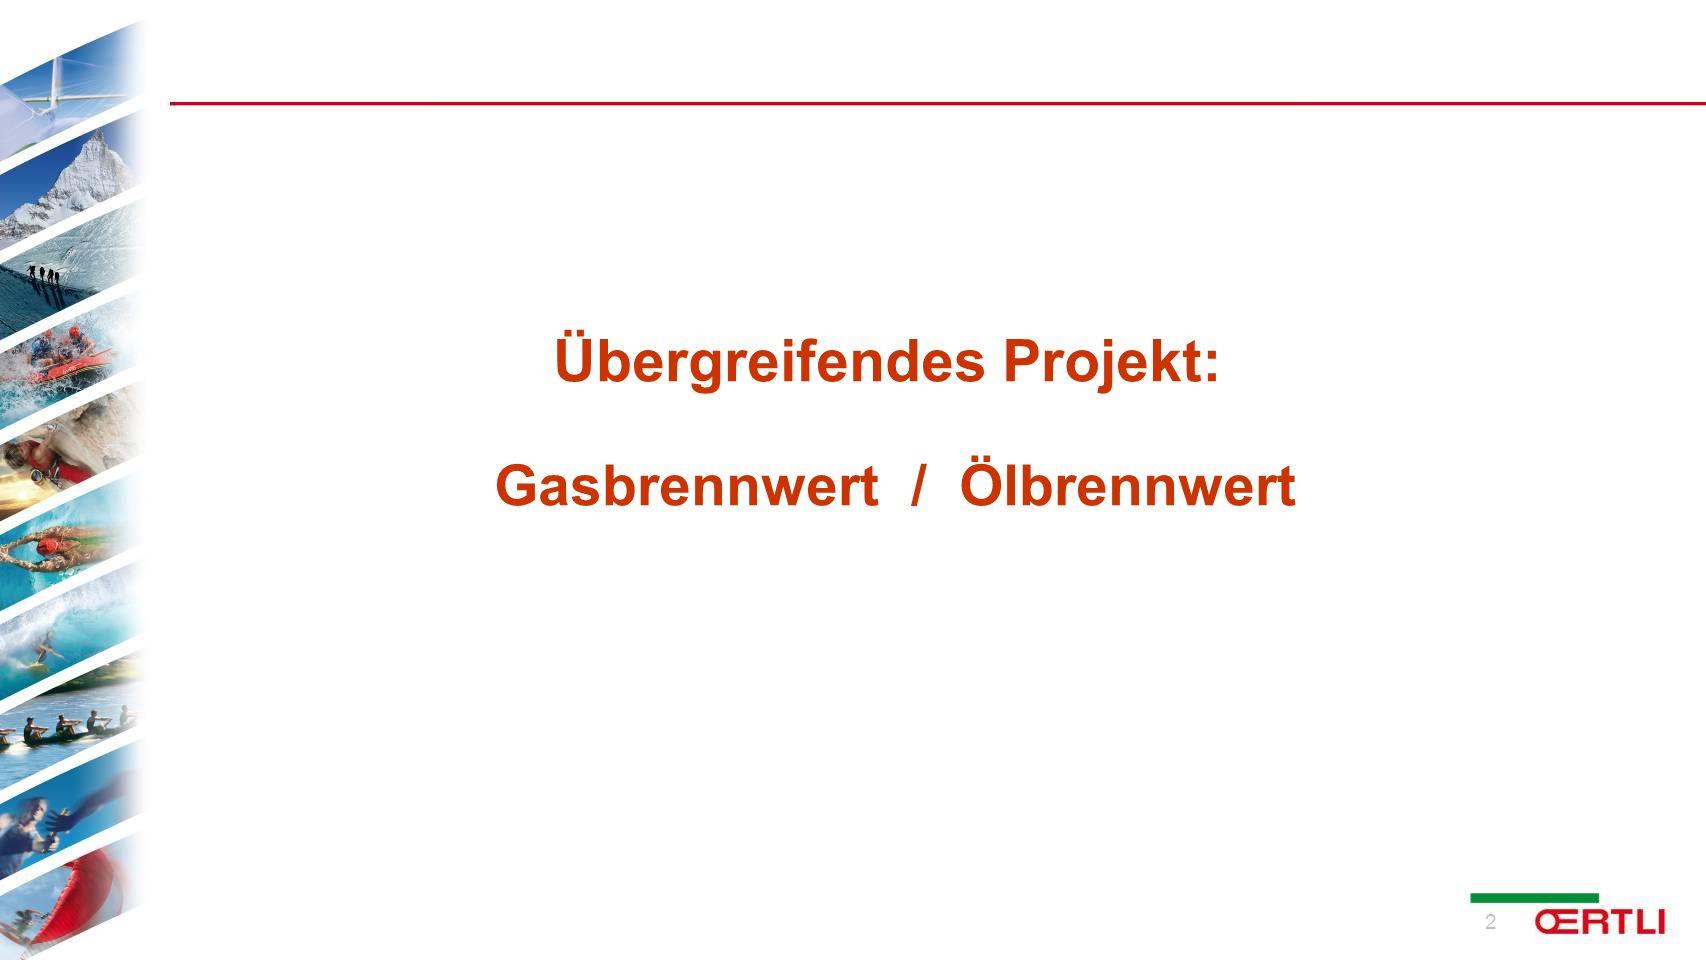 Übergreifendes Projekt: Gasbrennwert / Ölbrennwert